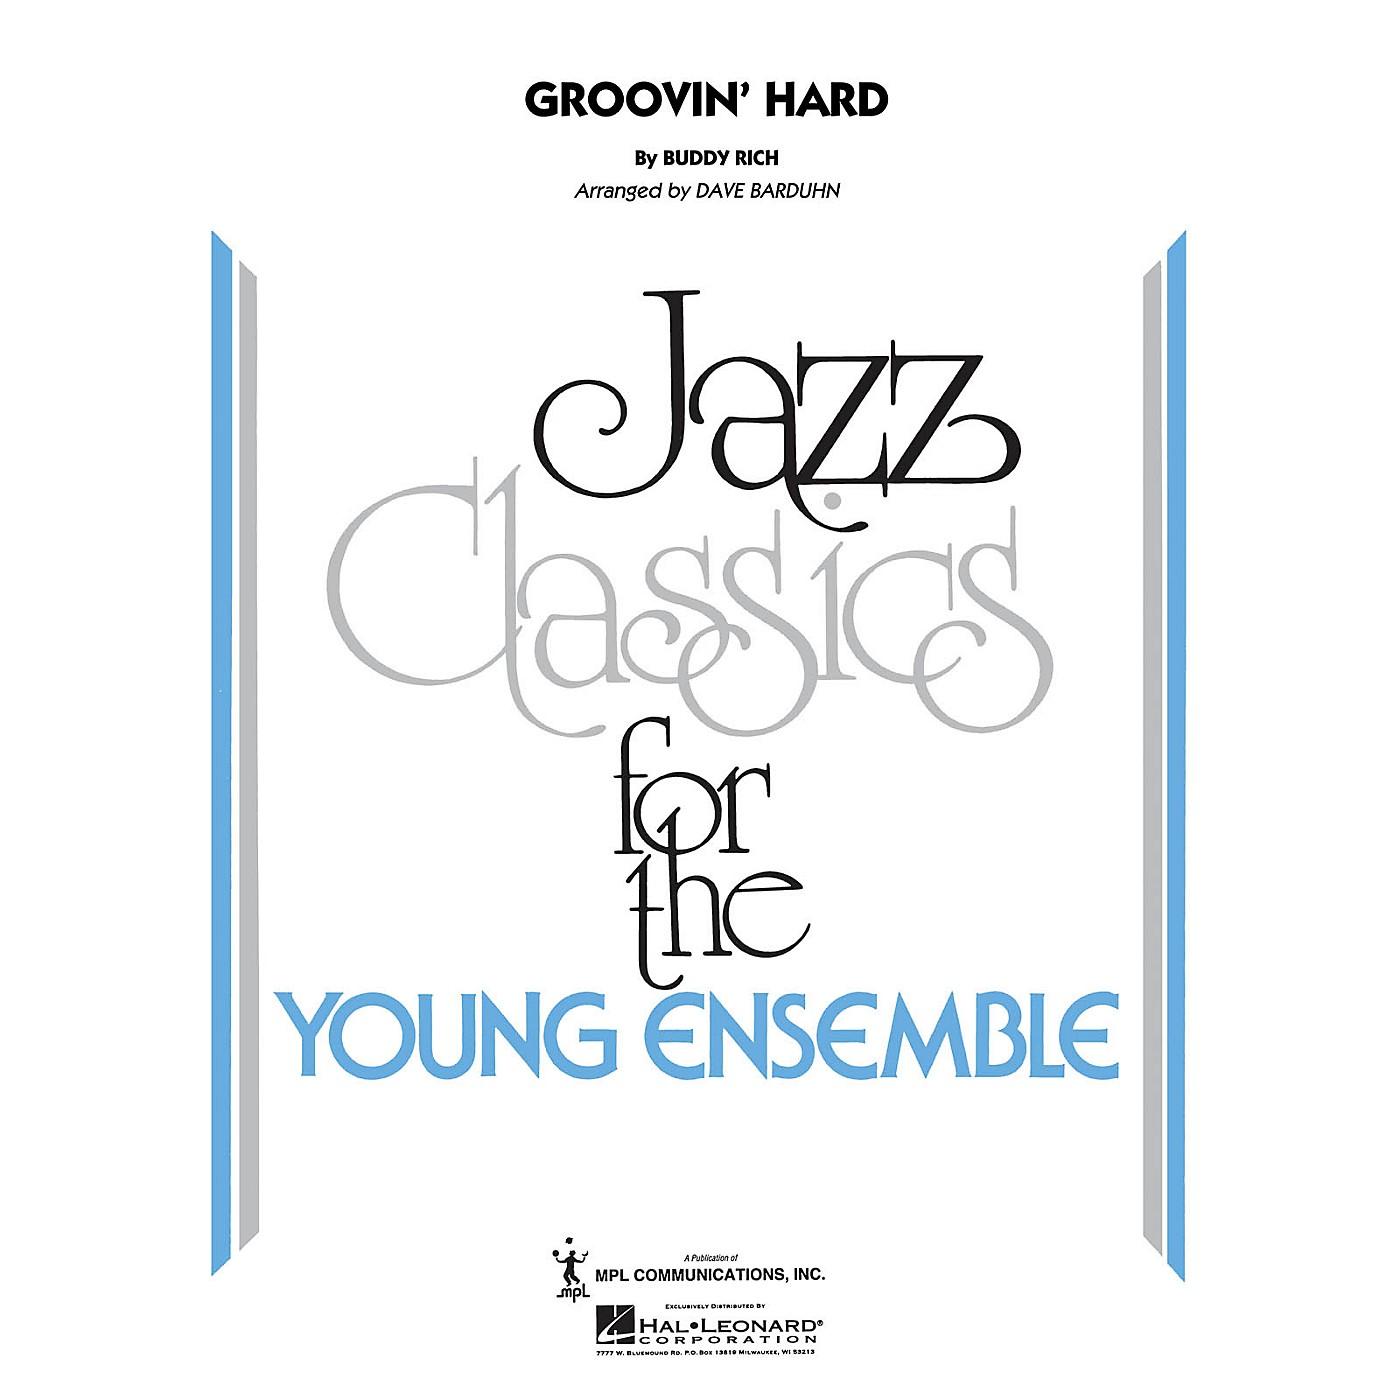 Hal Leonard Groovin' Hard Jazz Band Level 3 by Buddy Rich Arranged by Dave Barduhn thumbnail